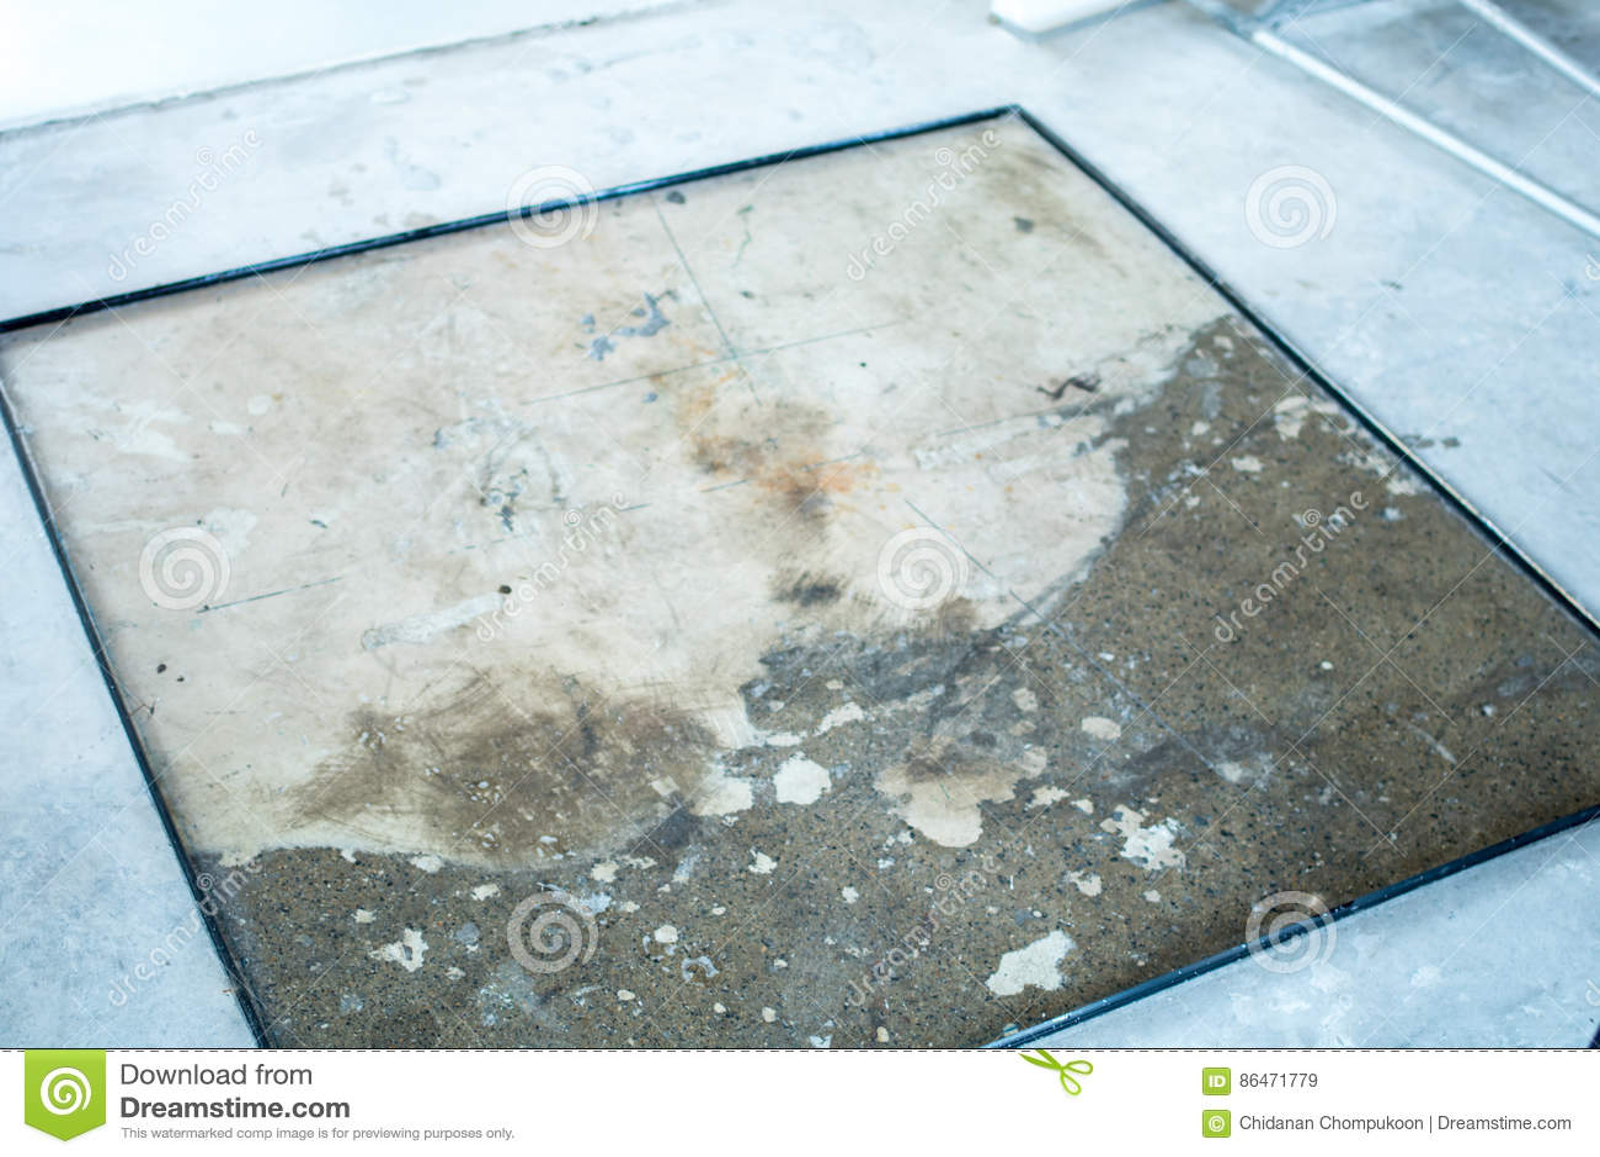 Terrazzo Floor Mold Stock Image Image Of Demolition 86471779